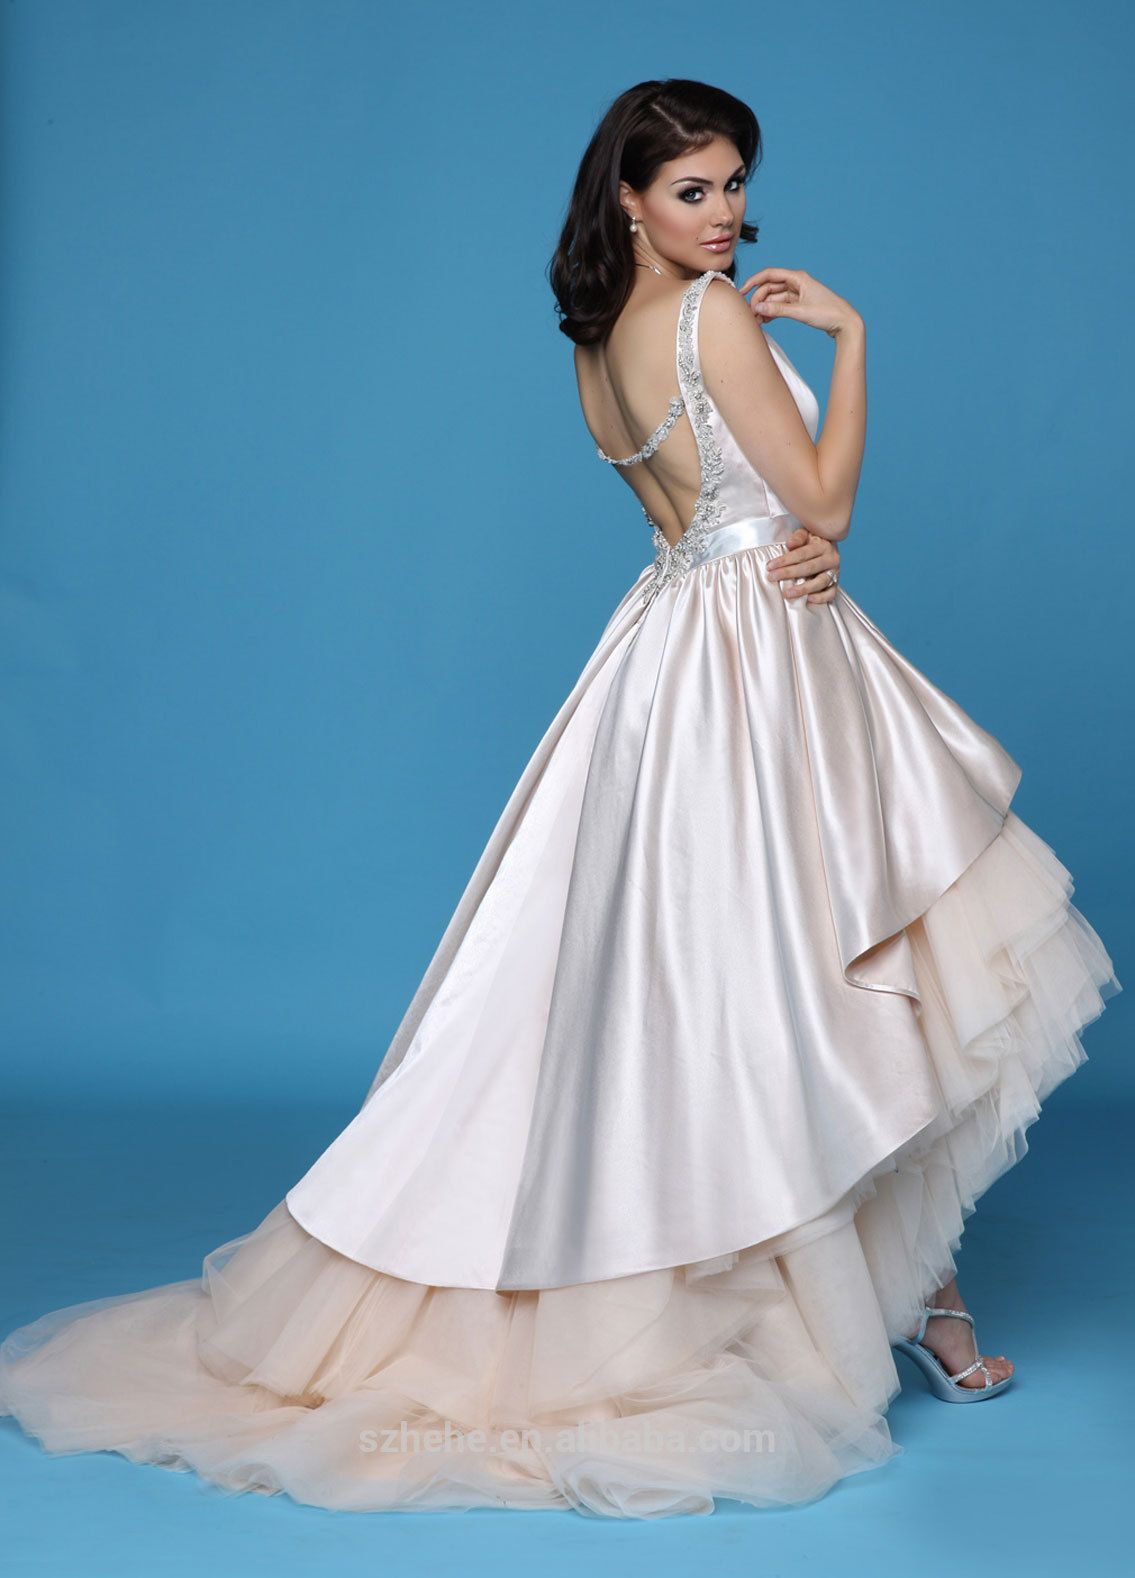 Cream colored vintage wedding dresses  JMBridals CW Vintage square neckline beaded in cream color